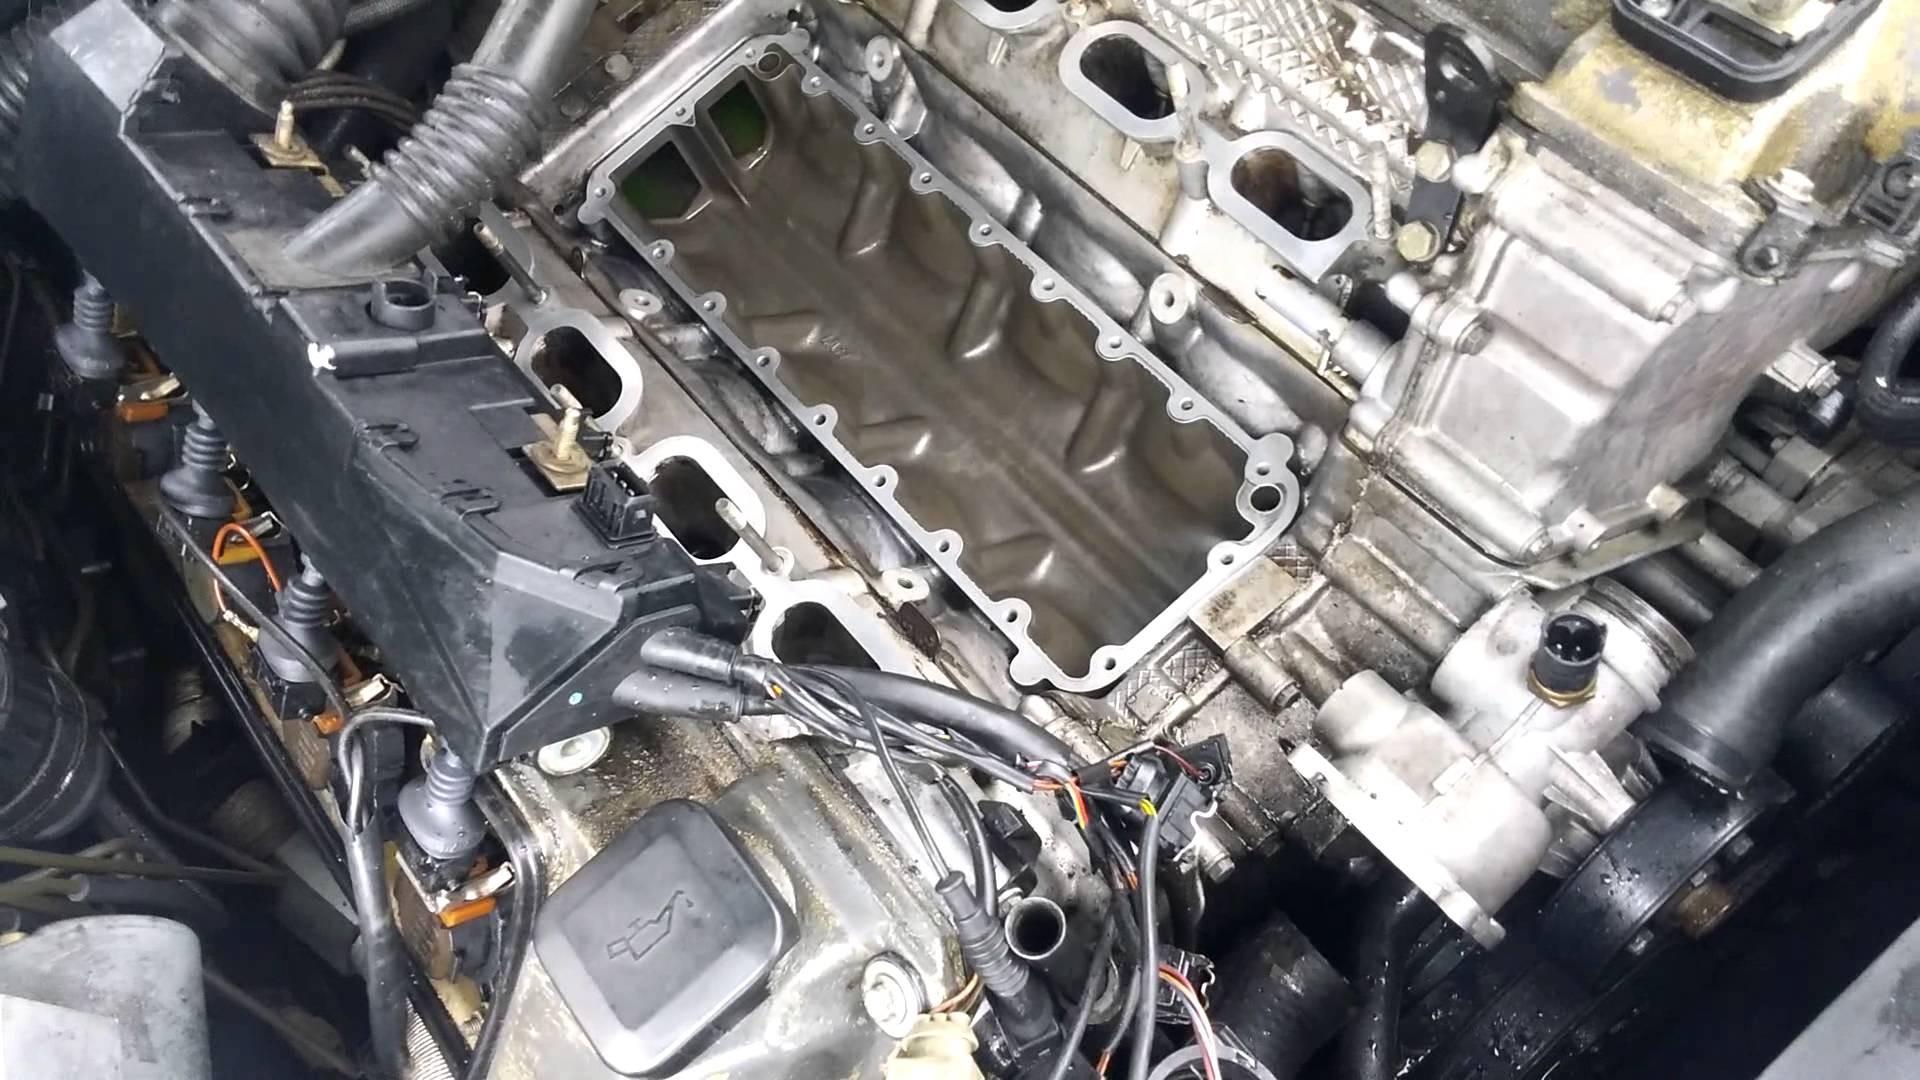 hight resolution of bmw 540i engine diagram 98 bmw 740il coolant leak repair of bmw 540i engine diagram 98